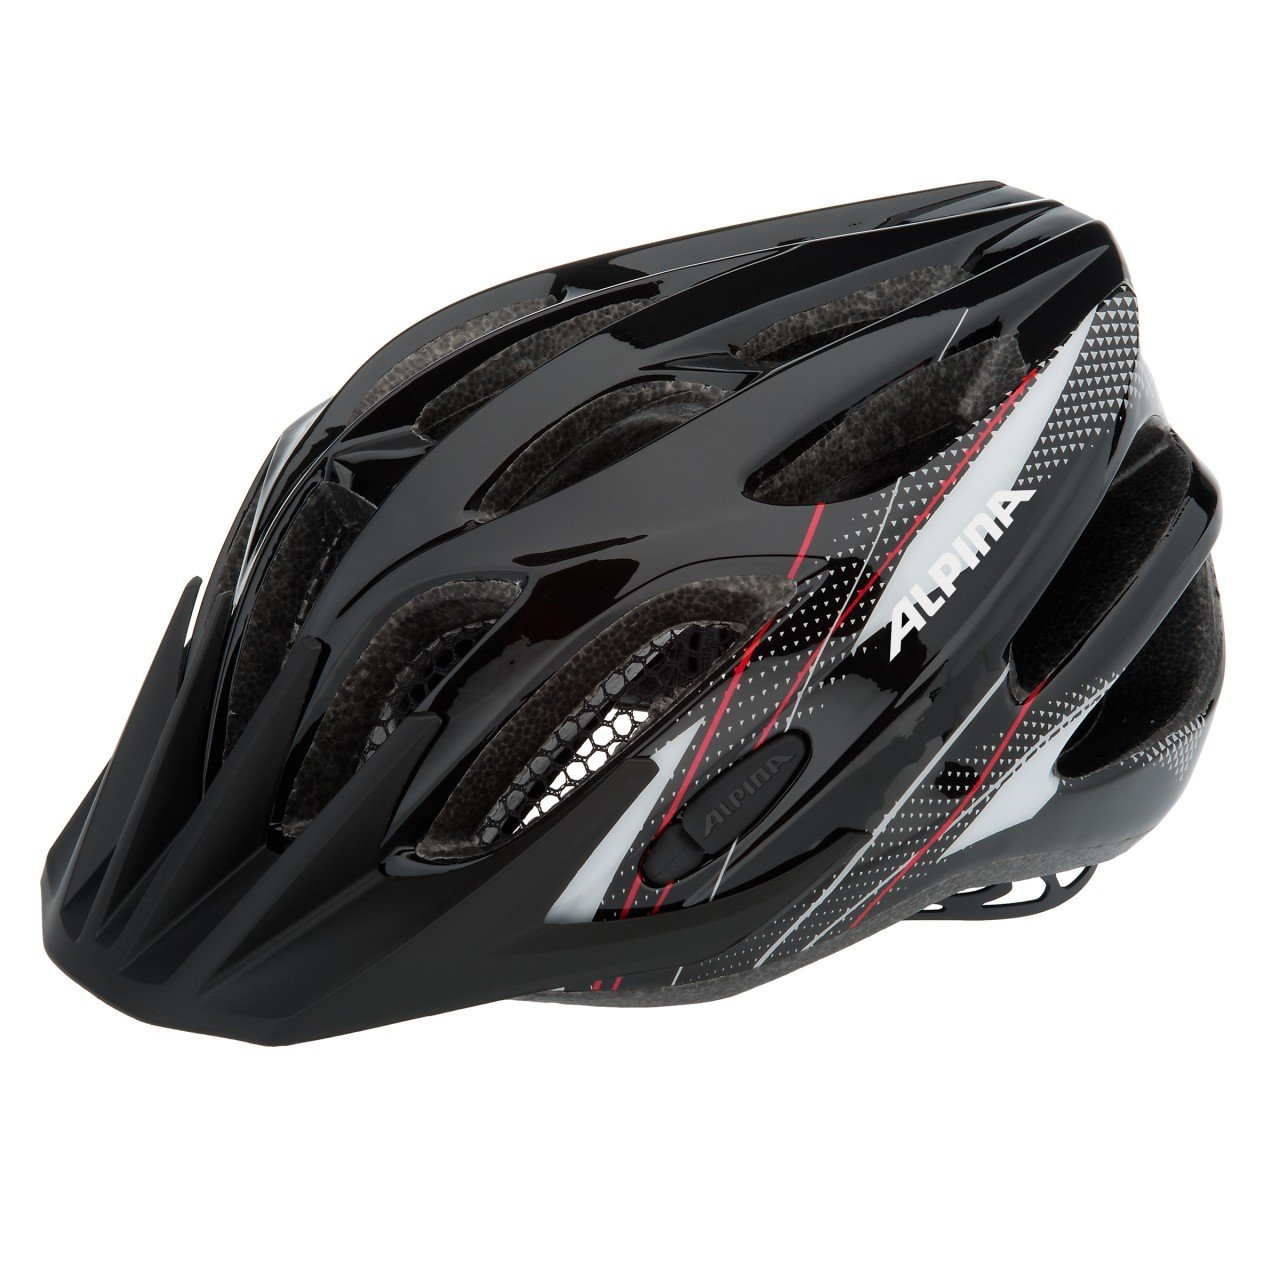 50-57 cm Ventura Shark Casco de ciclismo para ni/ños color plateado